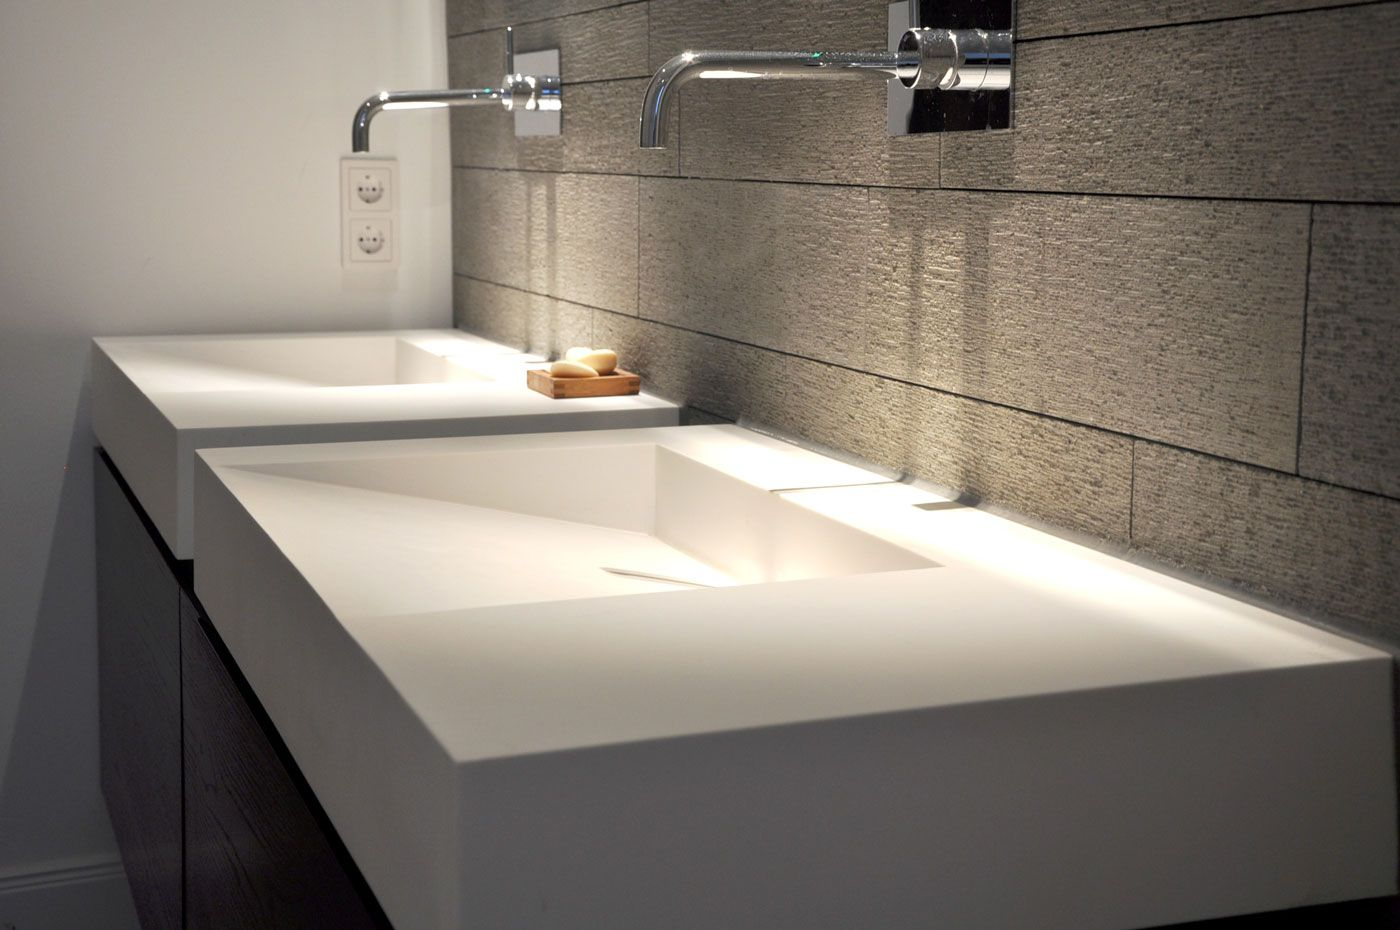 Pin By Kristina On Bathroom Elegant Bathroom Sink Design Luxury Bathroom